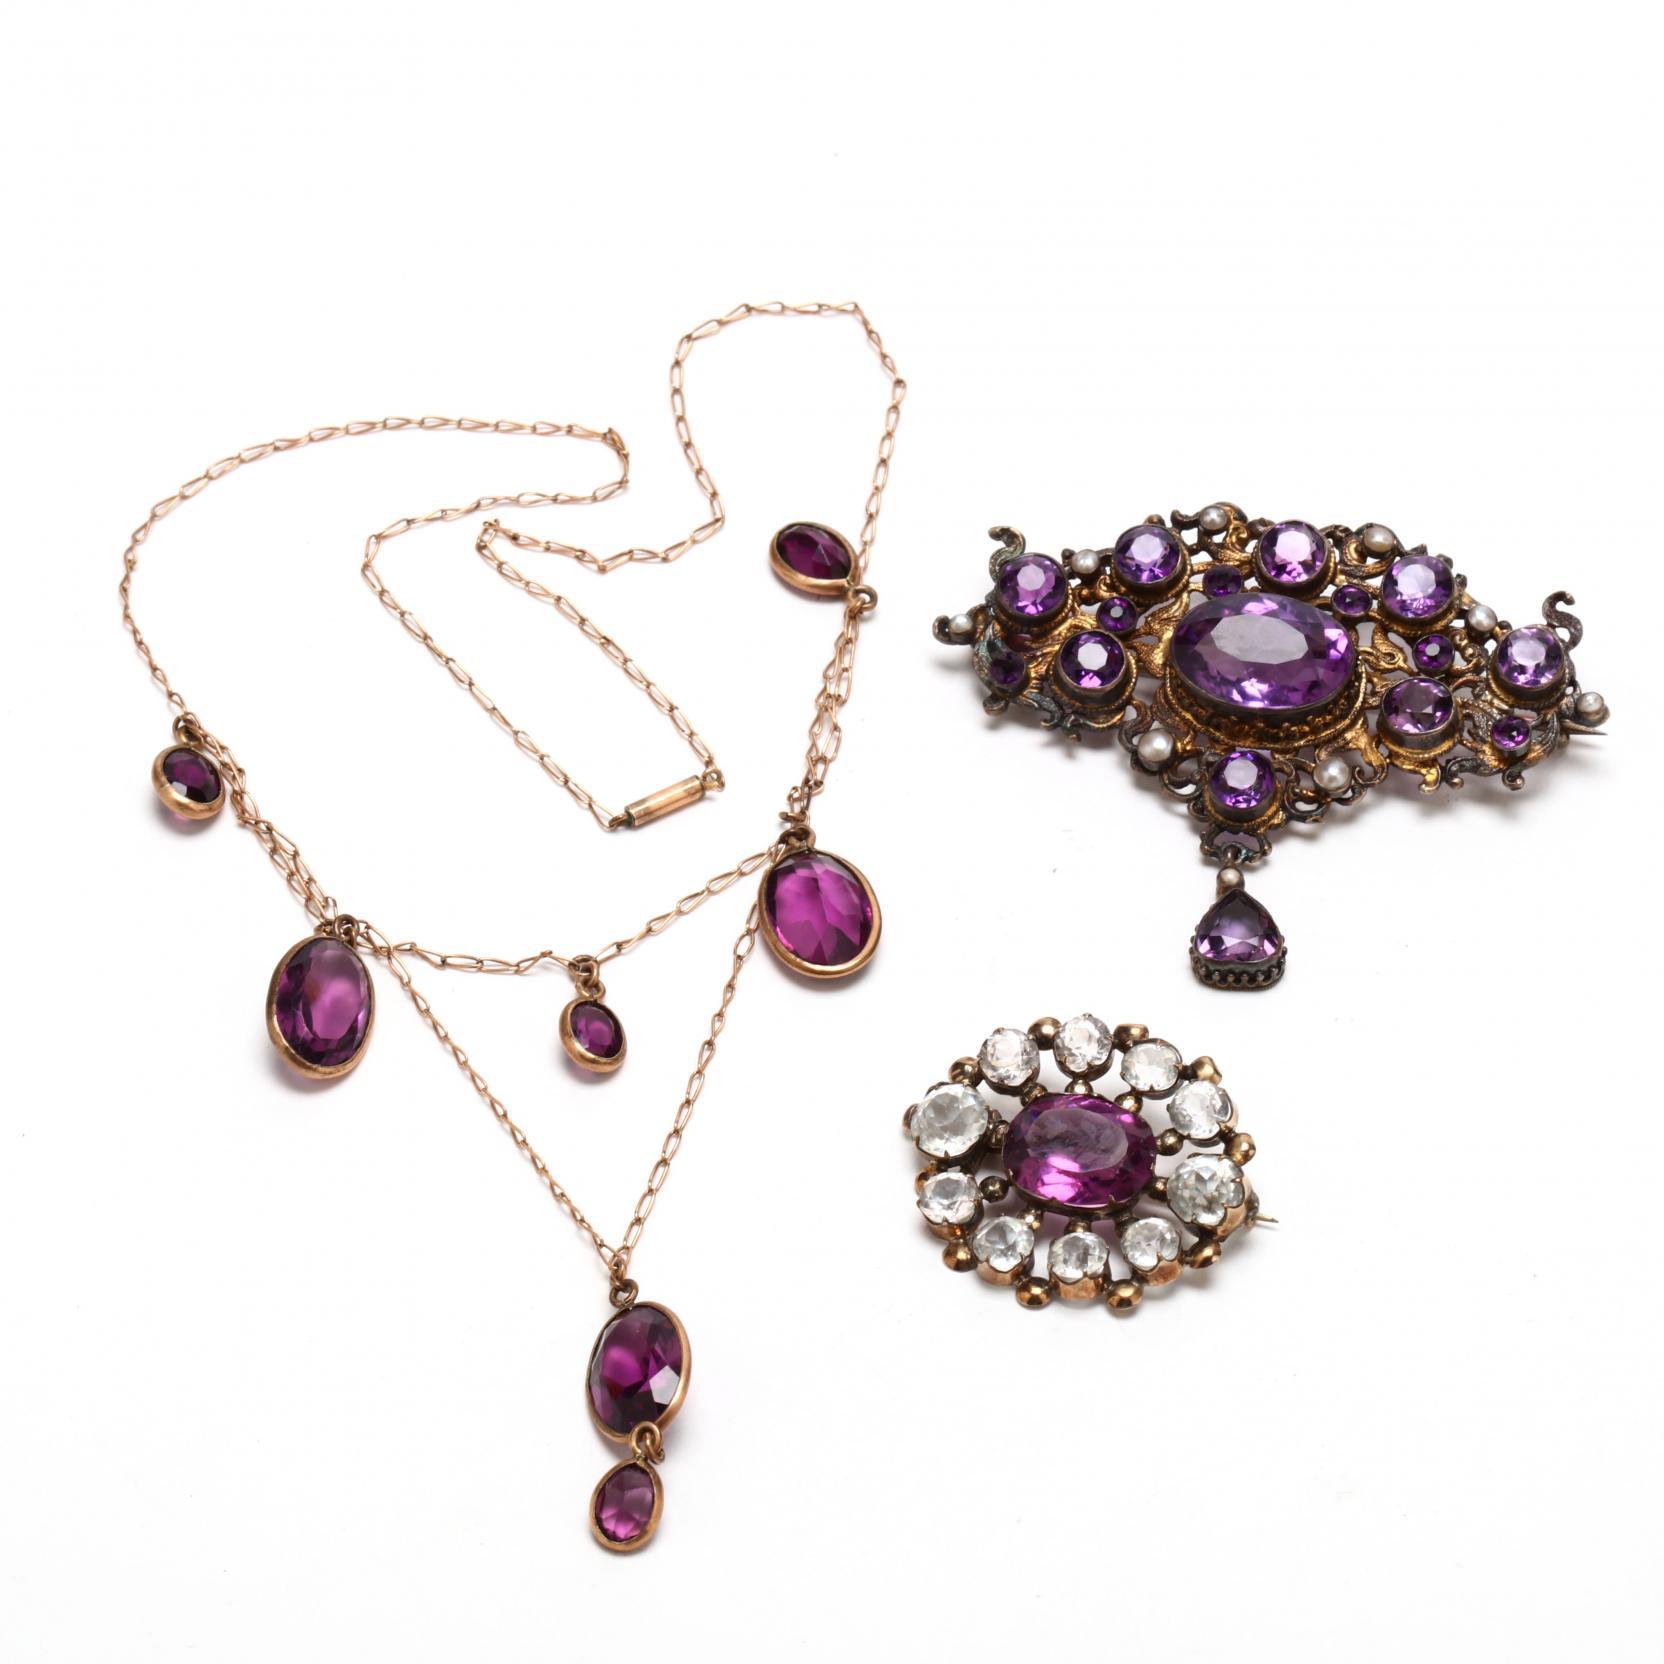 victorian-faux-amethyst-jewelry